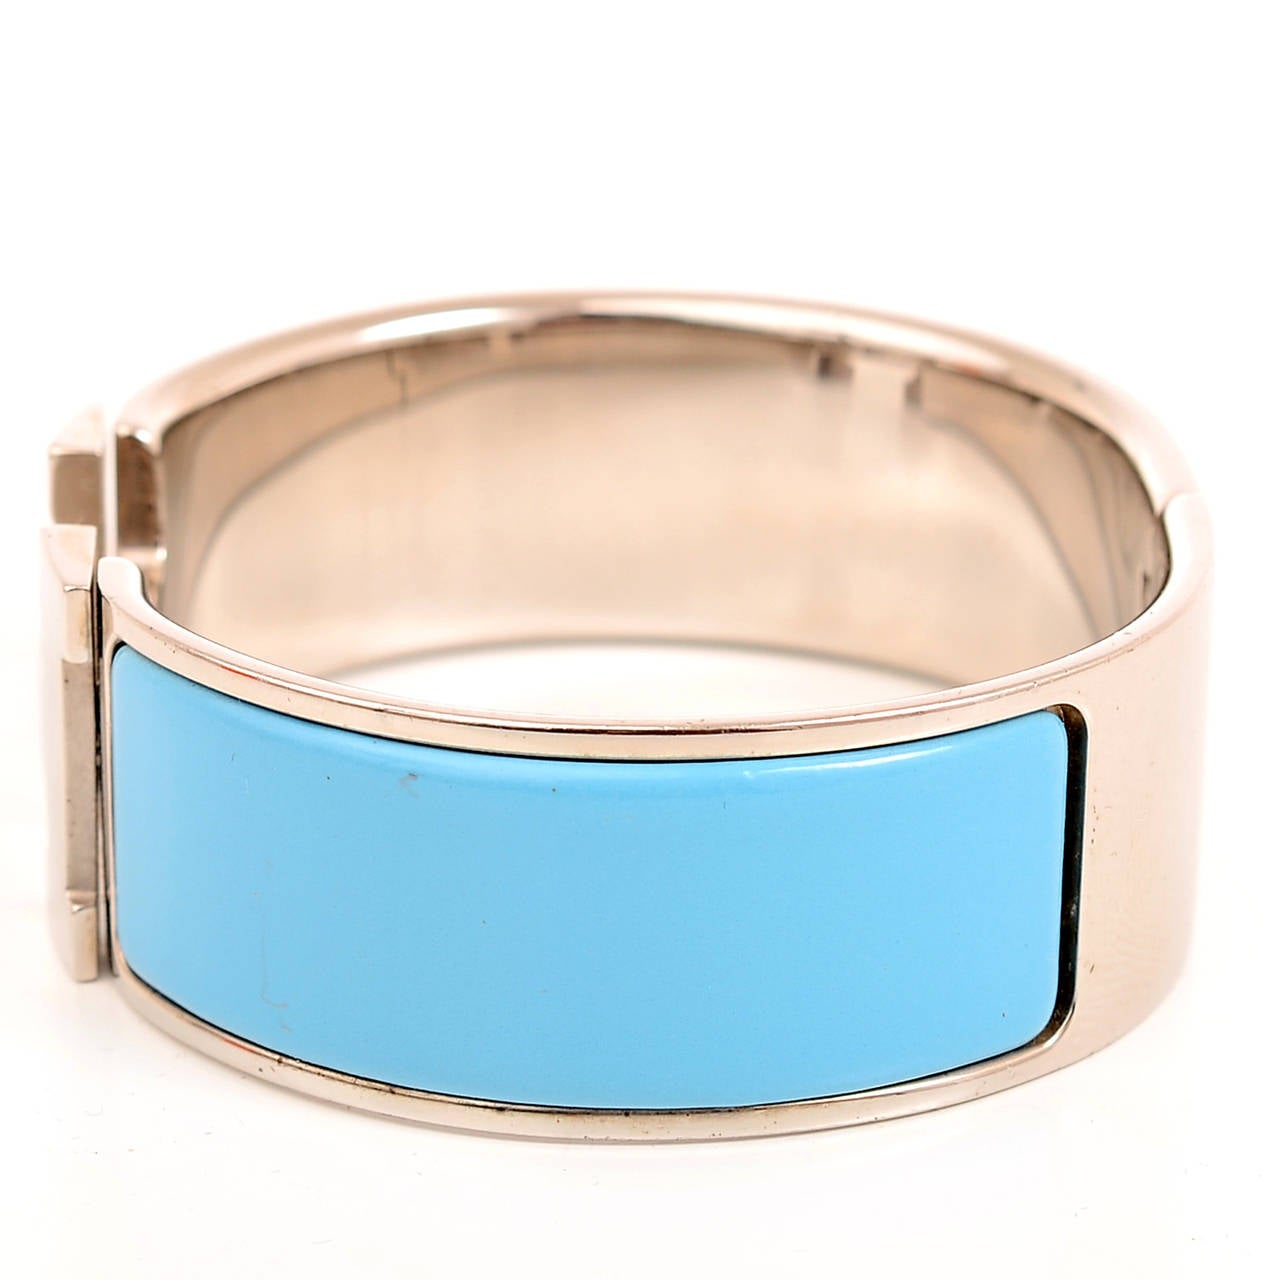 Hermes turquoise clic clac h wide enamel bracelet pm at - Housse clic clac turquoise ...